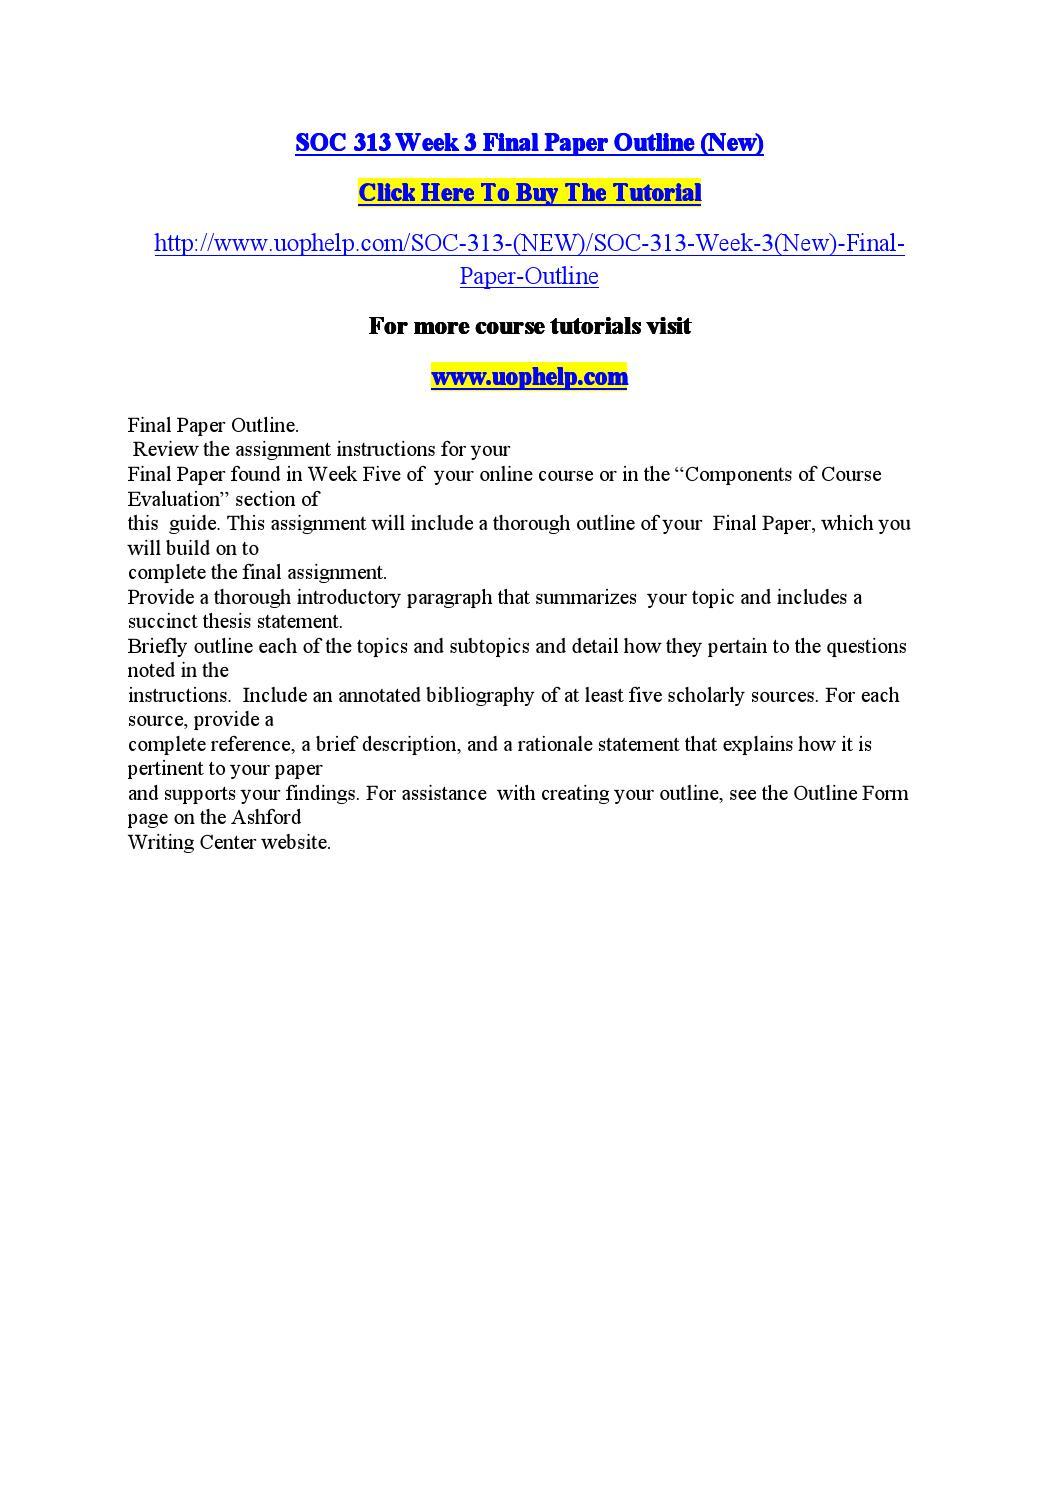 SOC 203 Ash Course Tutorial / Uophelp